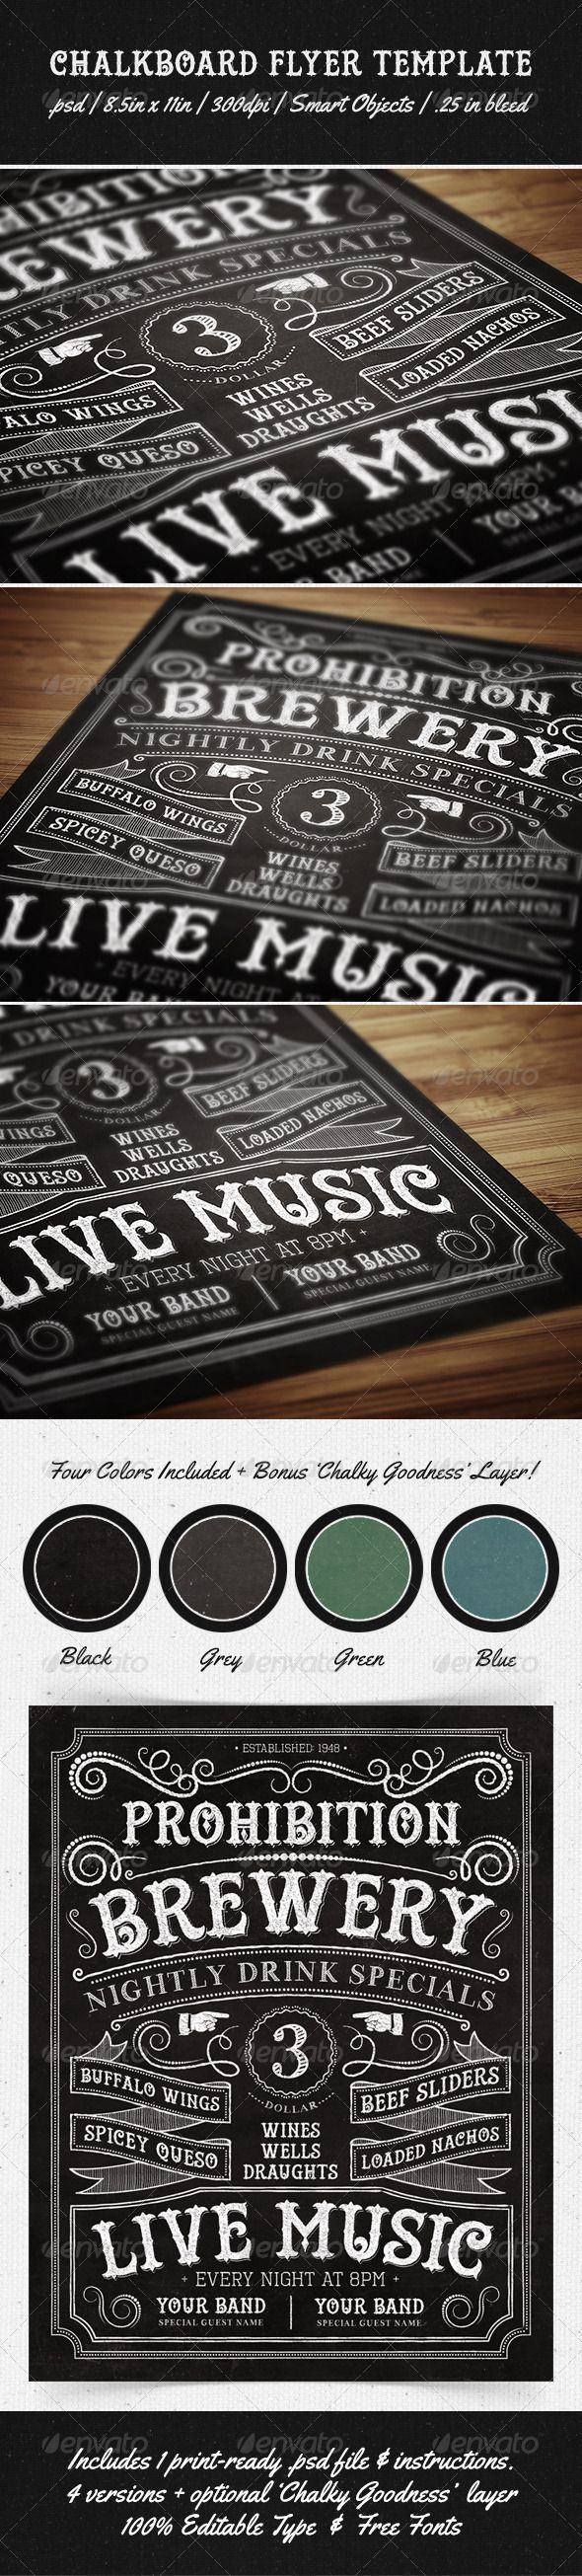 Chalkboard Flyer Template | Download: http://graphicriver.net/item/chalkboard-flyer-template/5405878?ref=ksioks